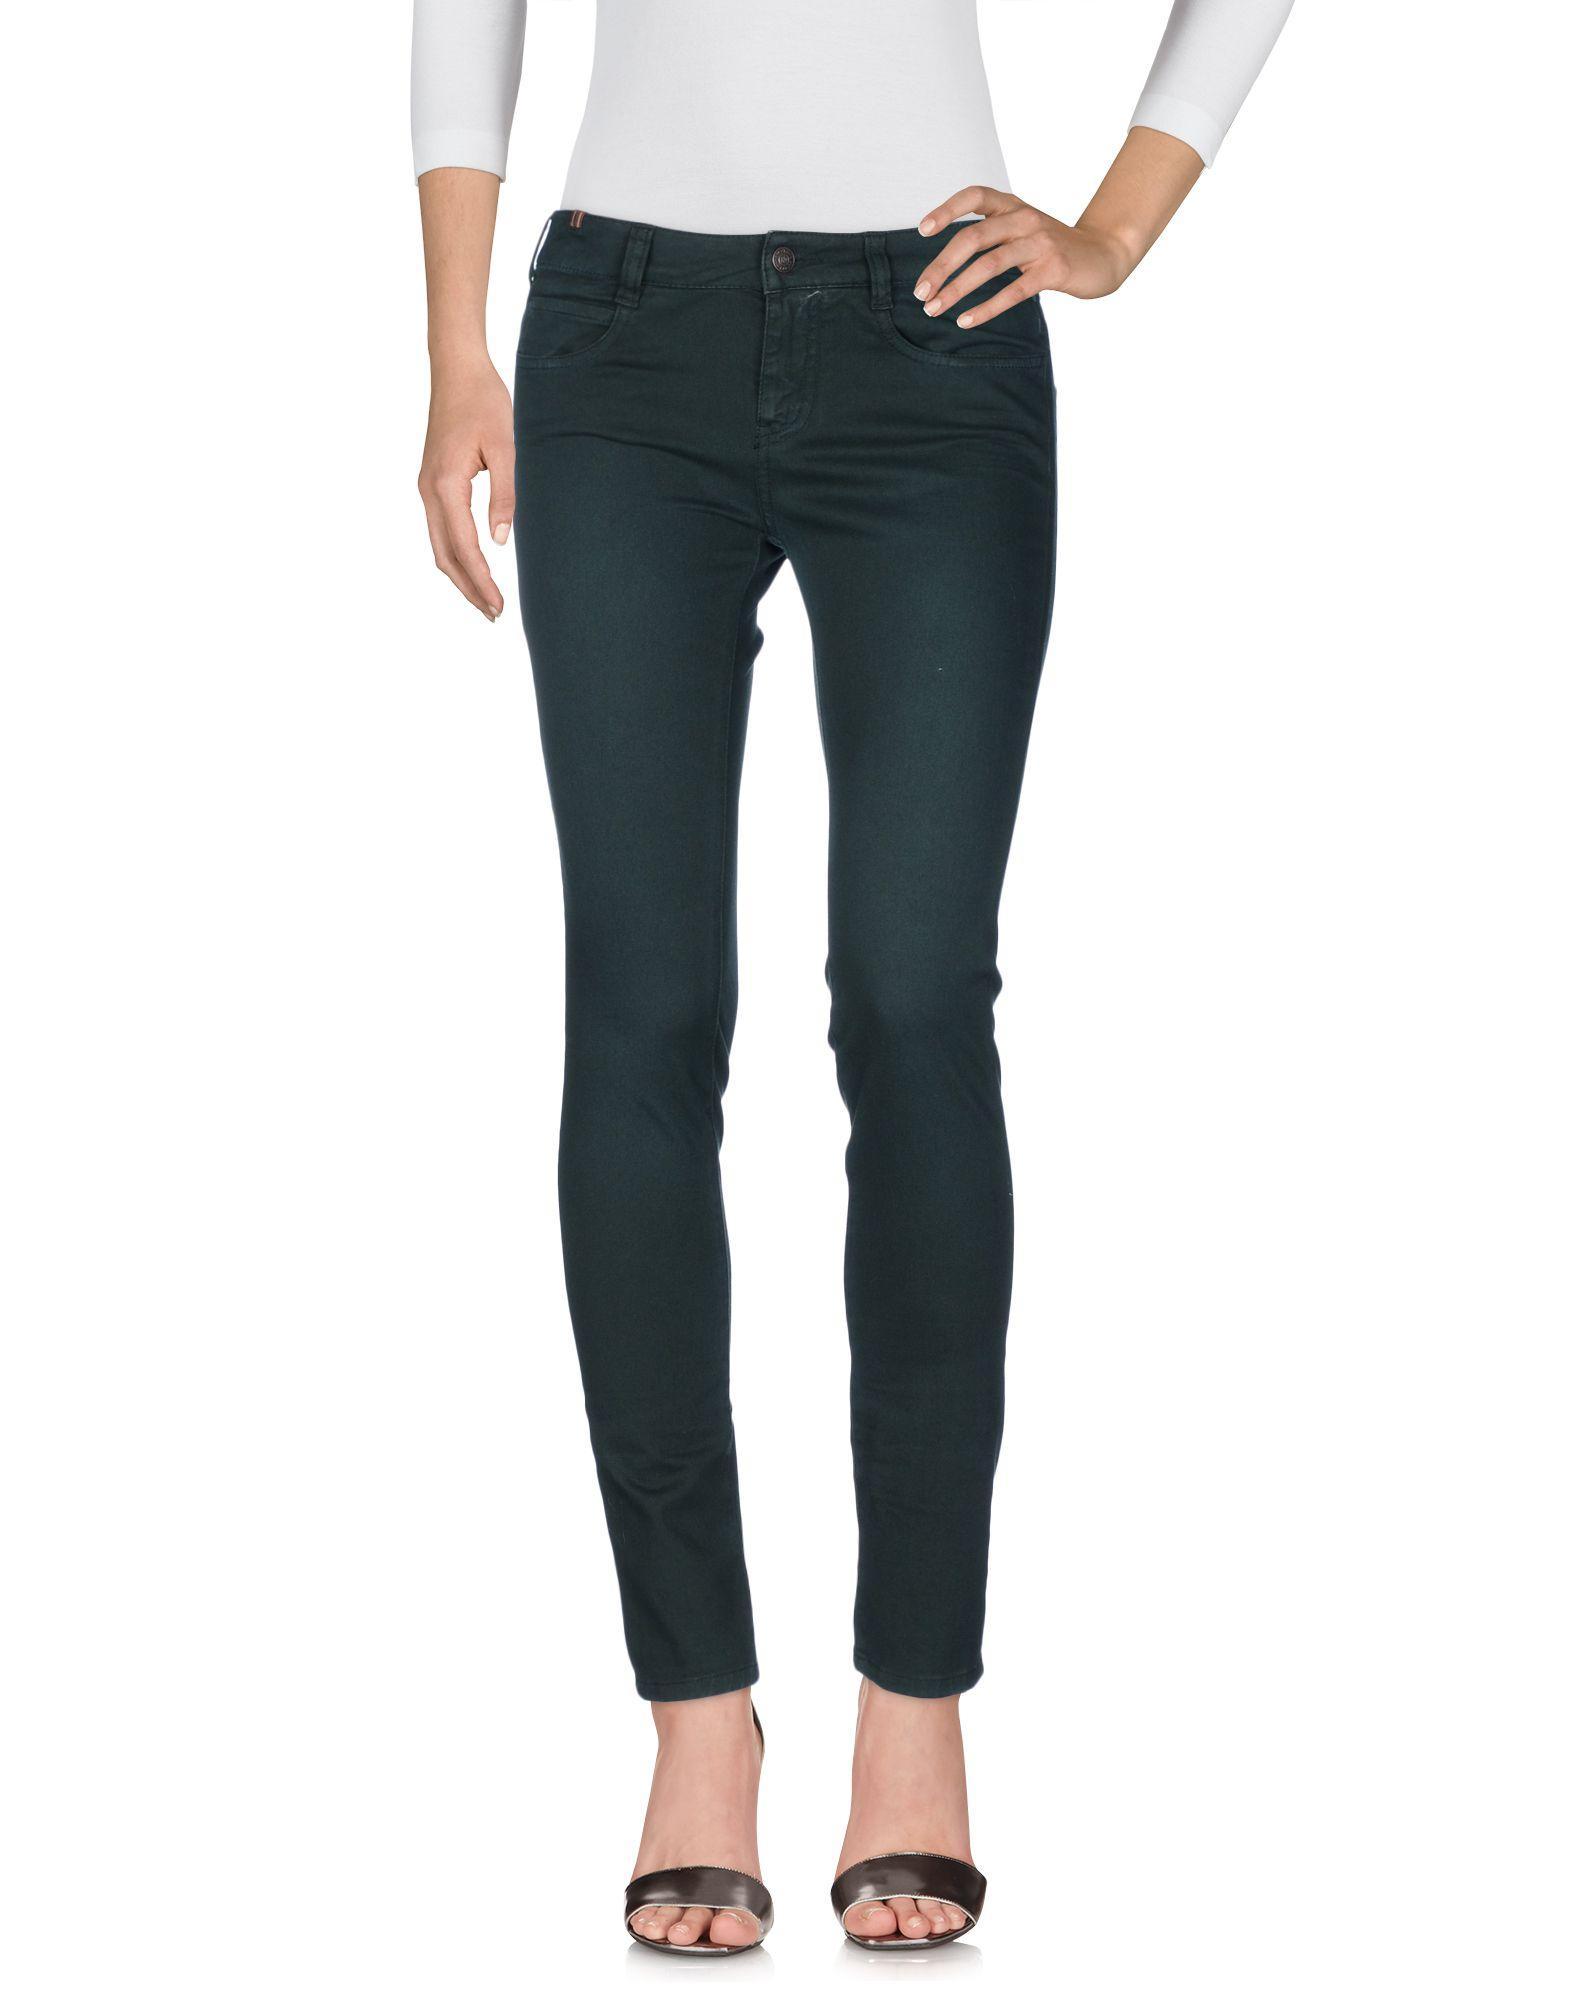 Pantaloni Jeans Notify Donna - Acquista online su iNTxpy